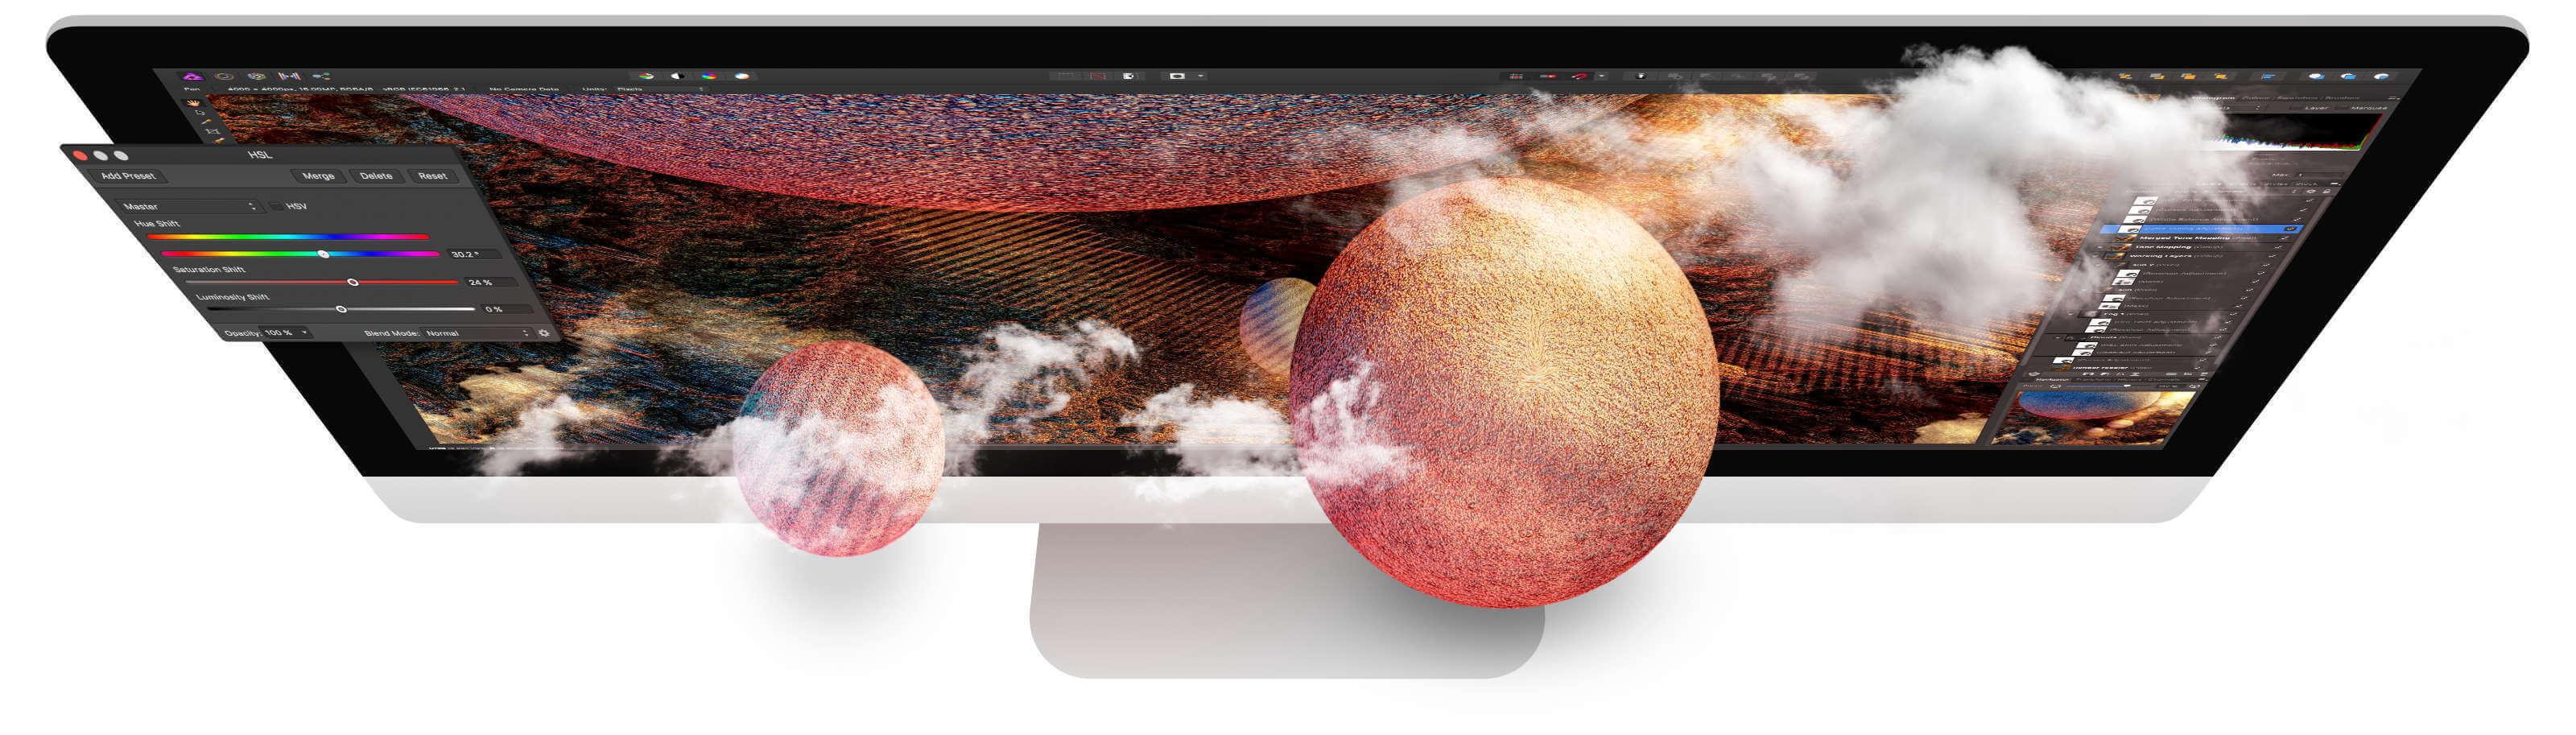 Affinity Photo V 1.8.1 MAC & V1.8.0.532 WIN – 完美的Photoshop替代方案